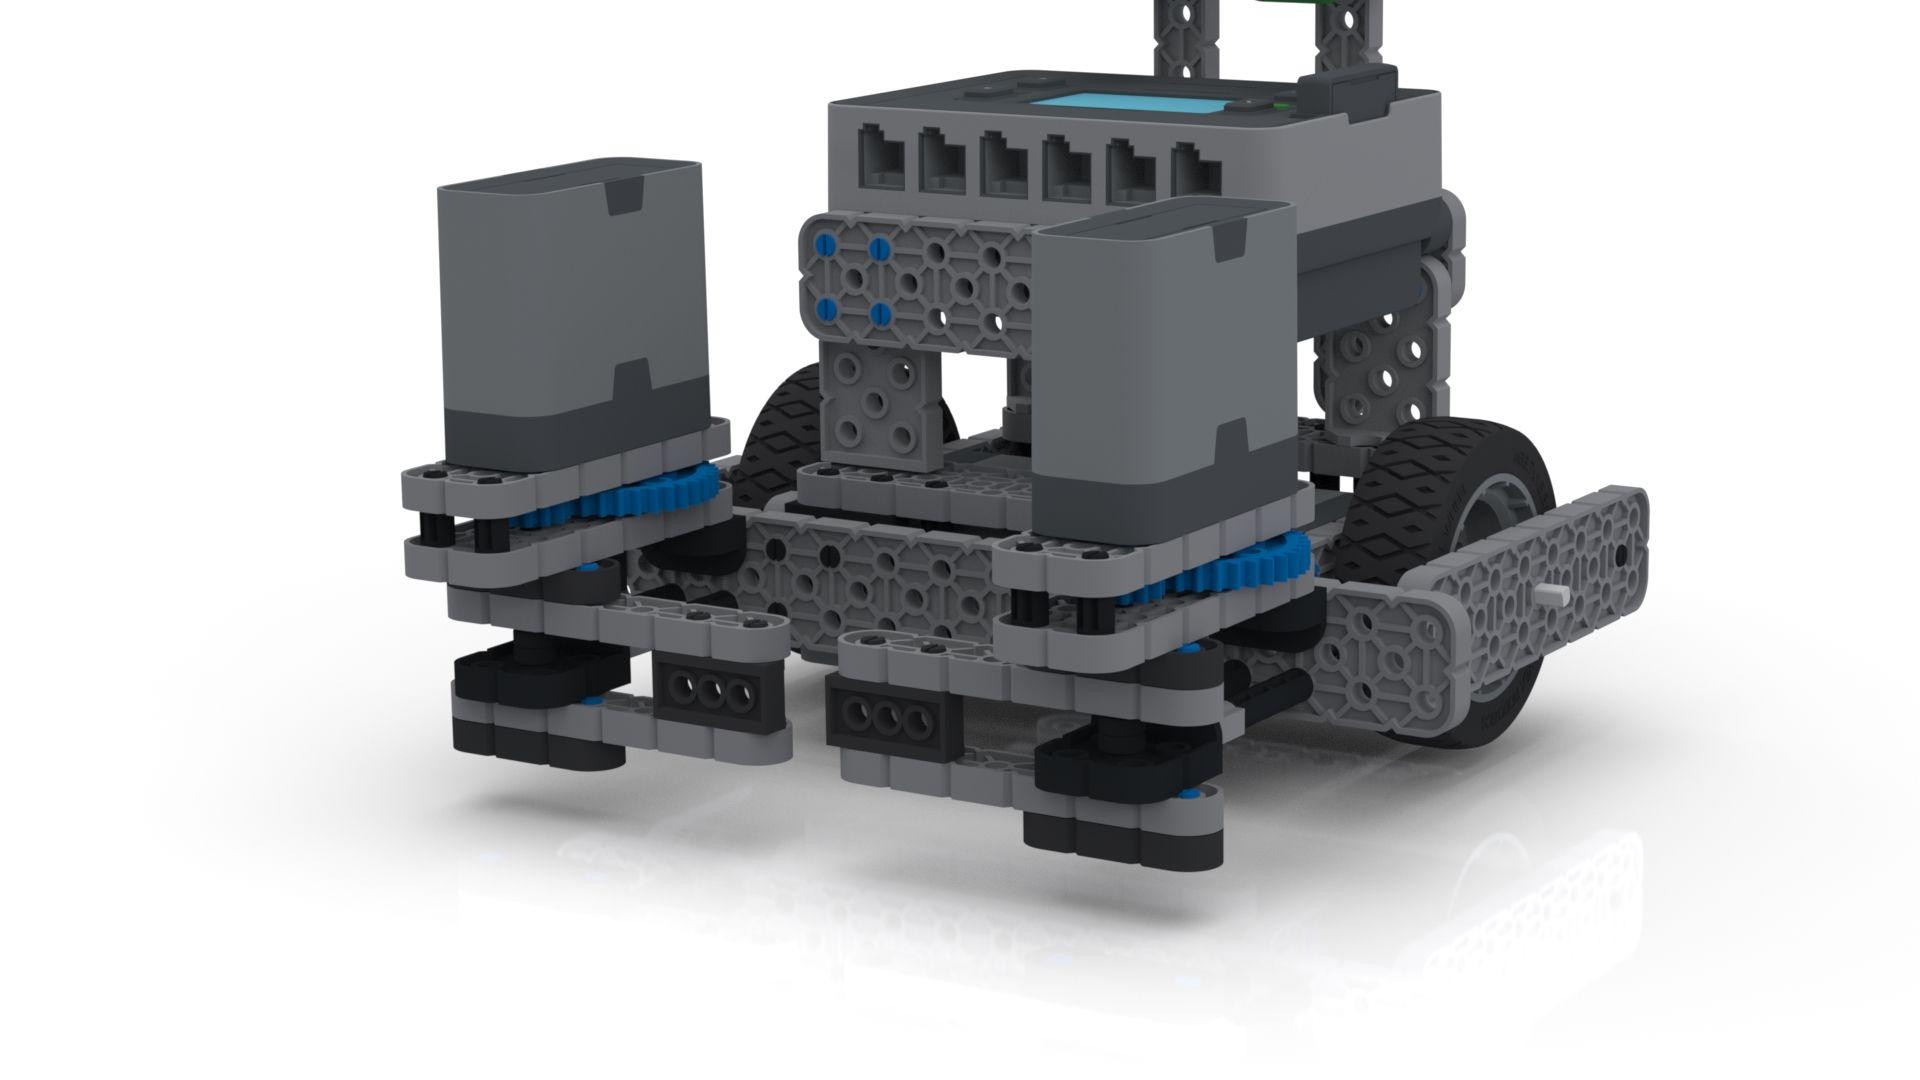 Fabrica-de-nerdes-vex-iq-lucas8-3500-3500